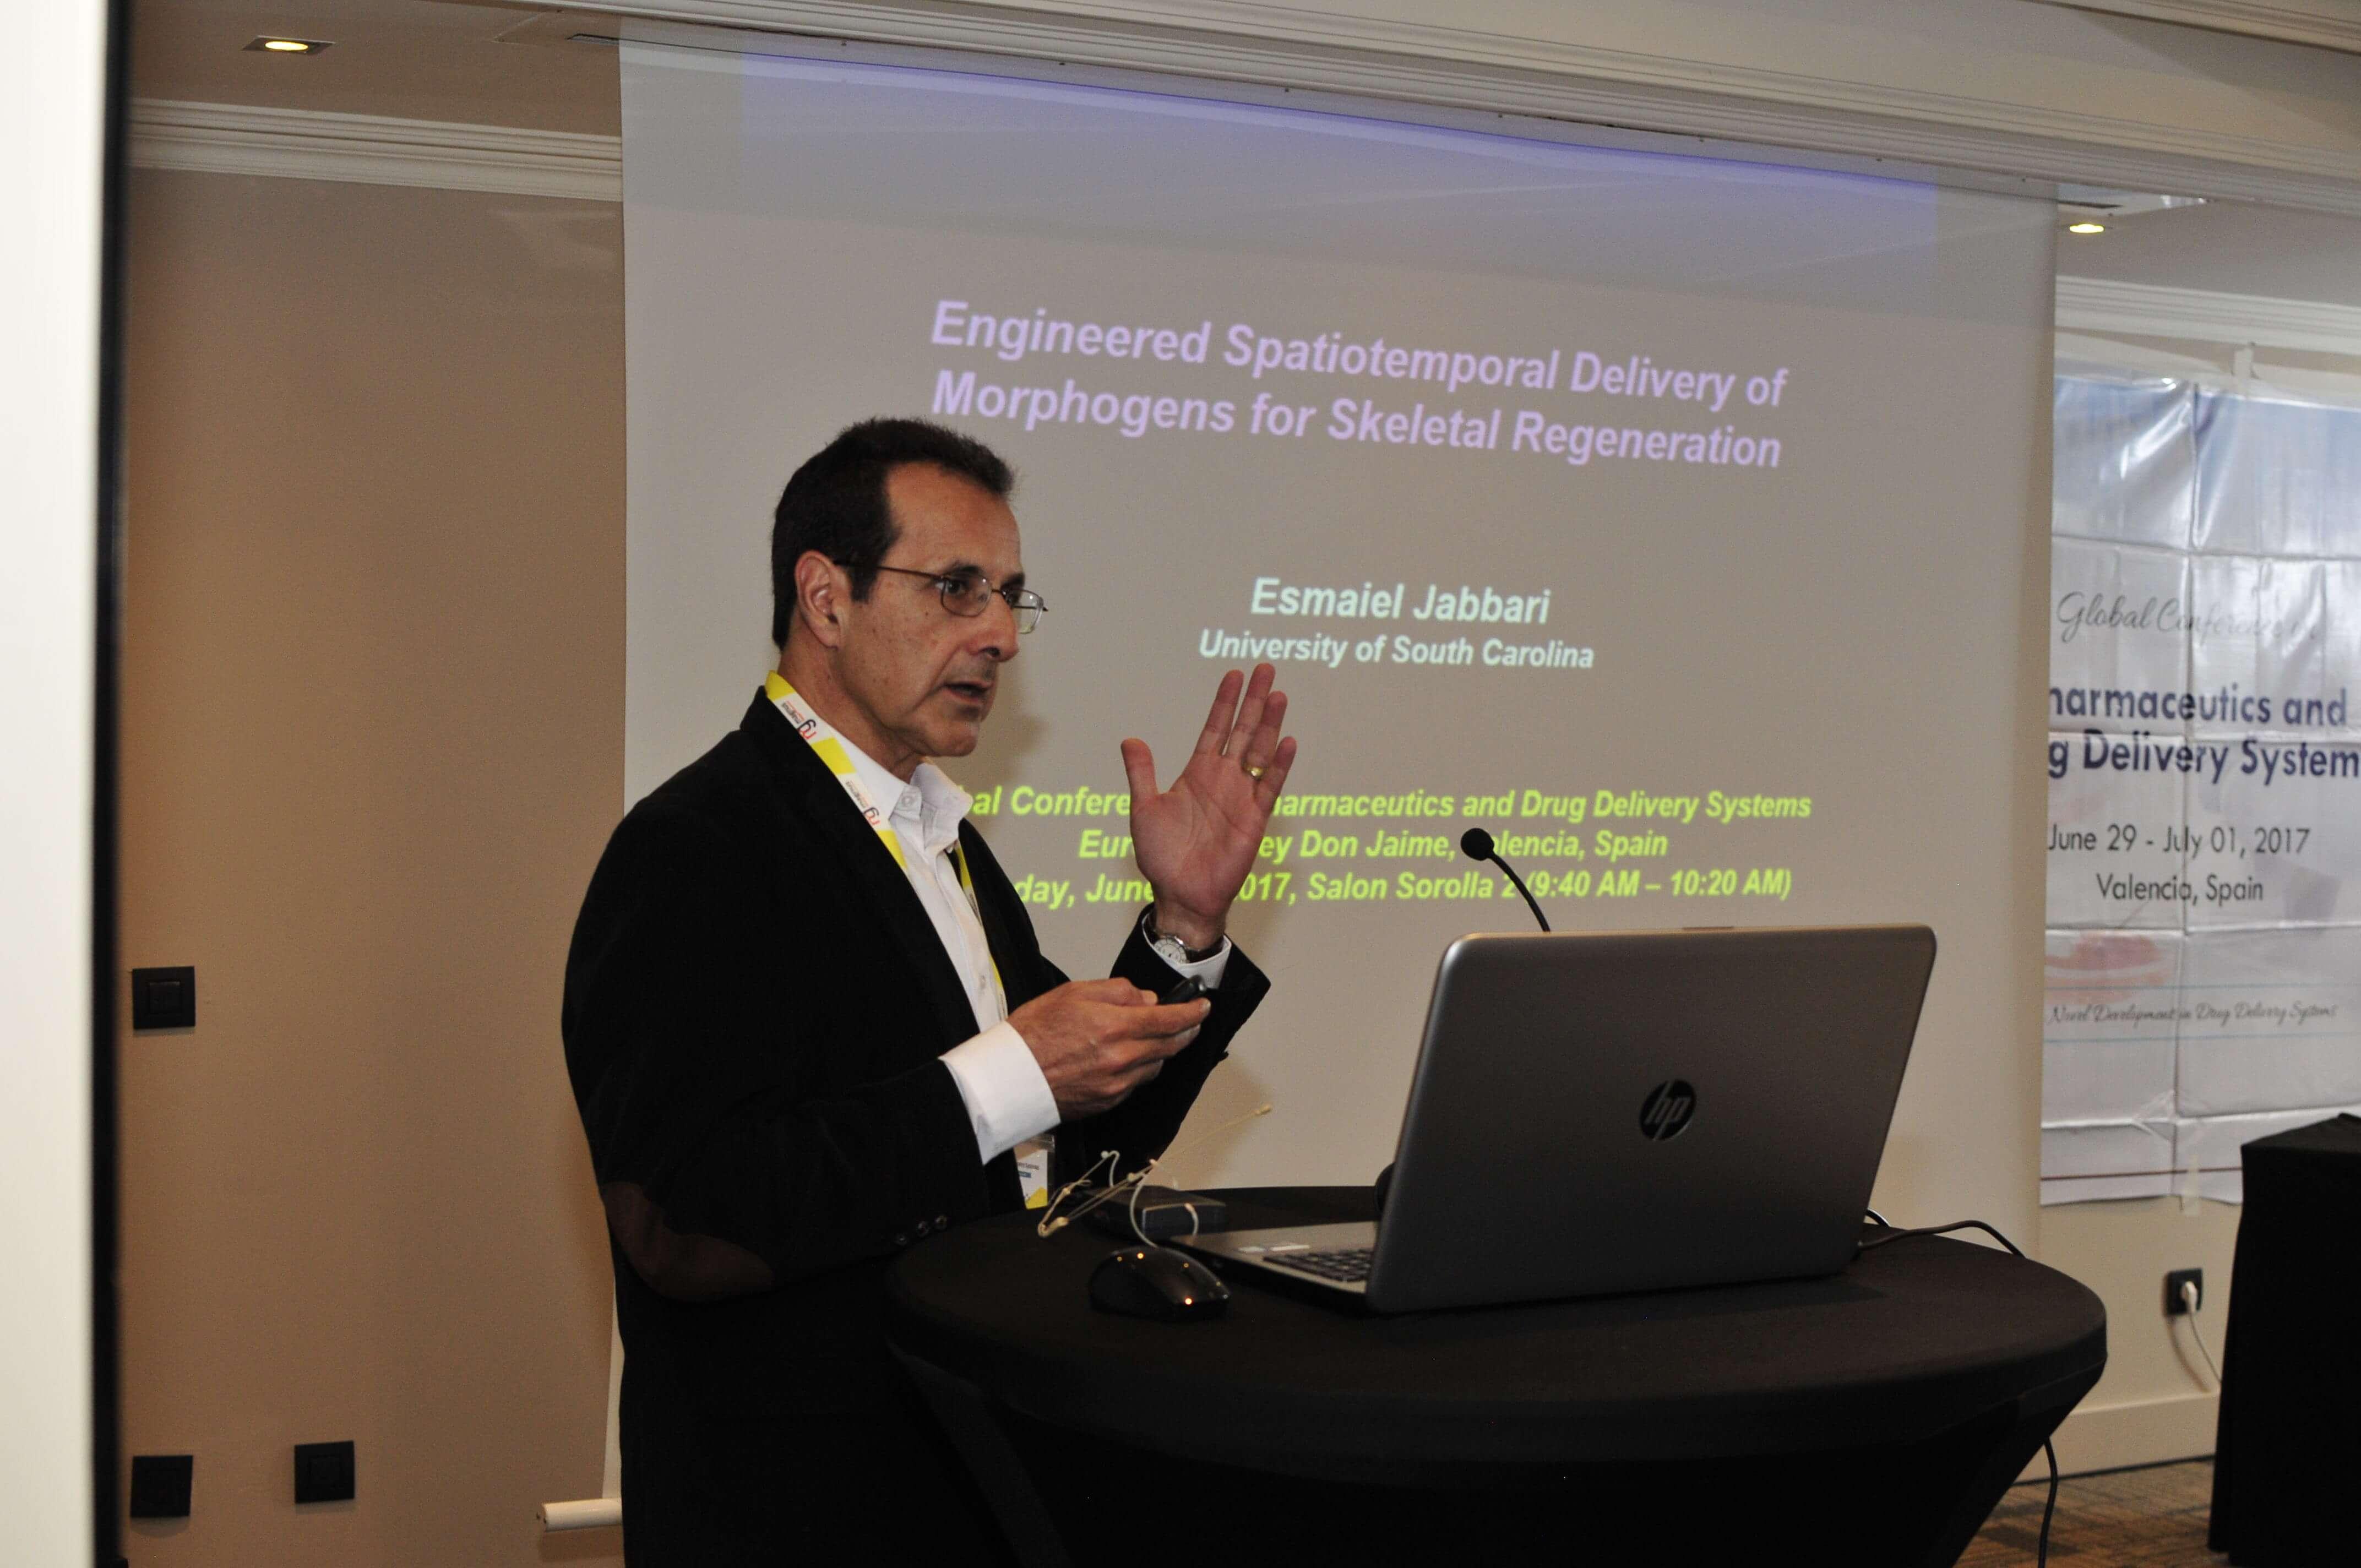 Leading speakers for Biotechnology summits-Esmaiel Jabbari